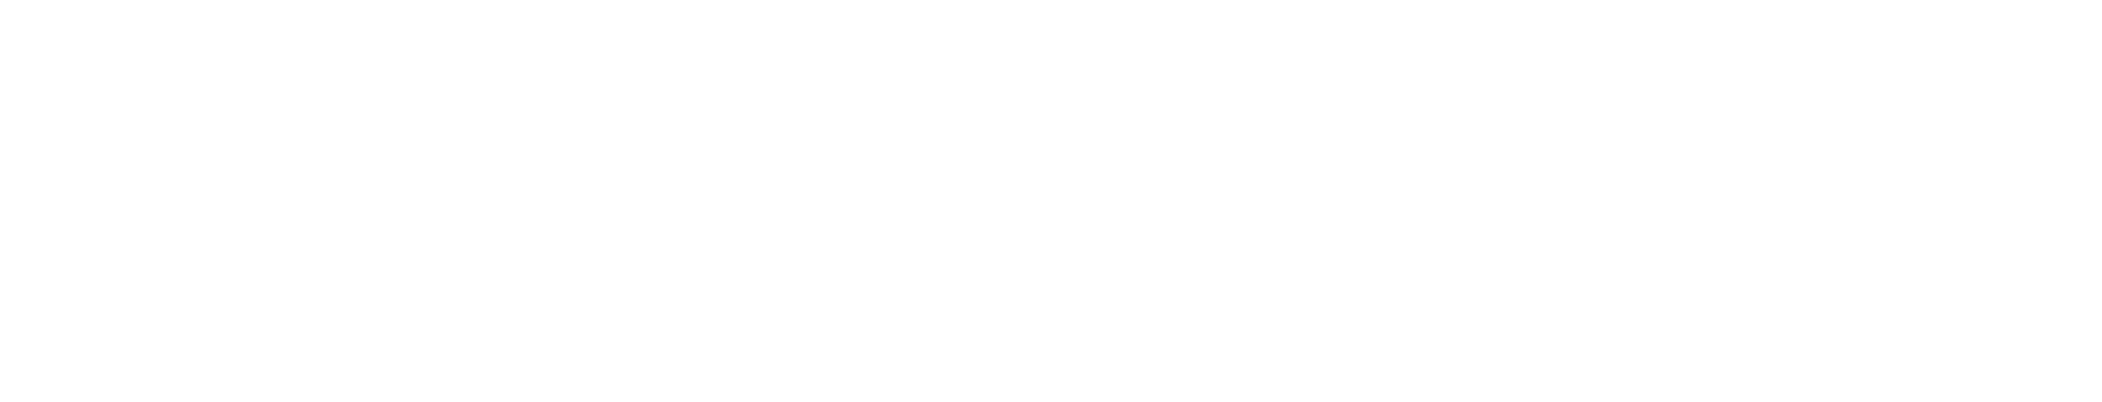 renforcement-communication-icone